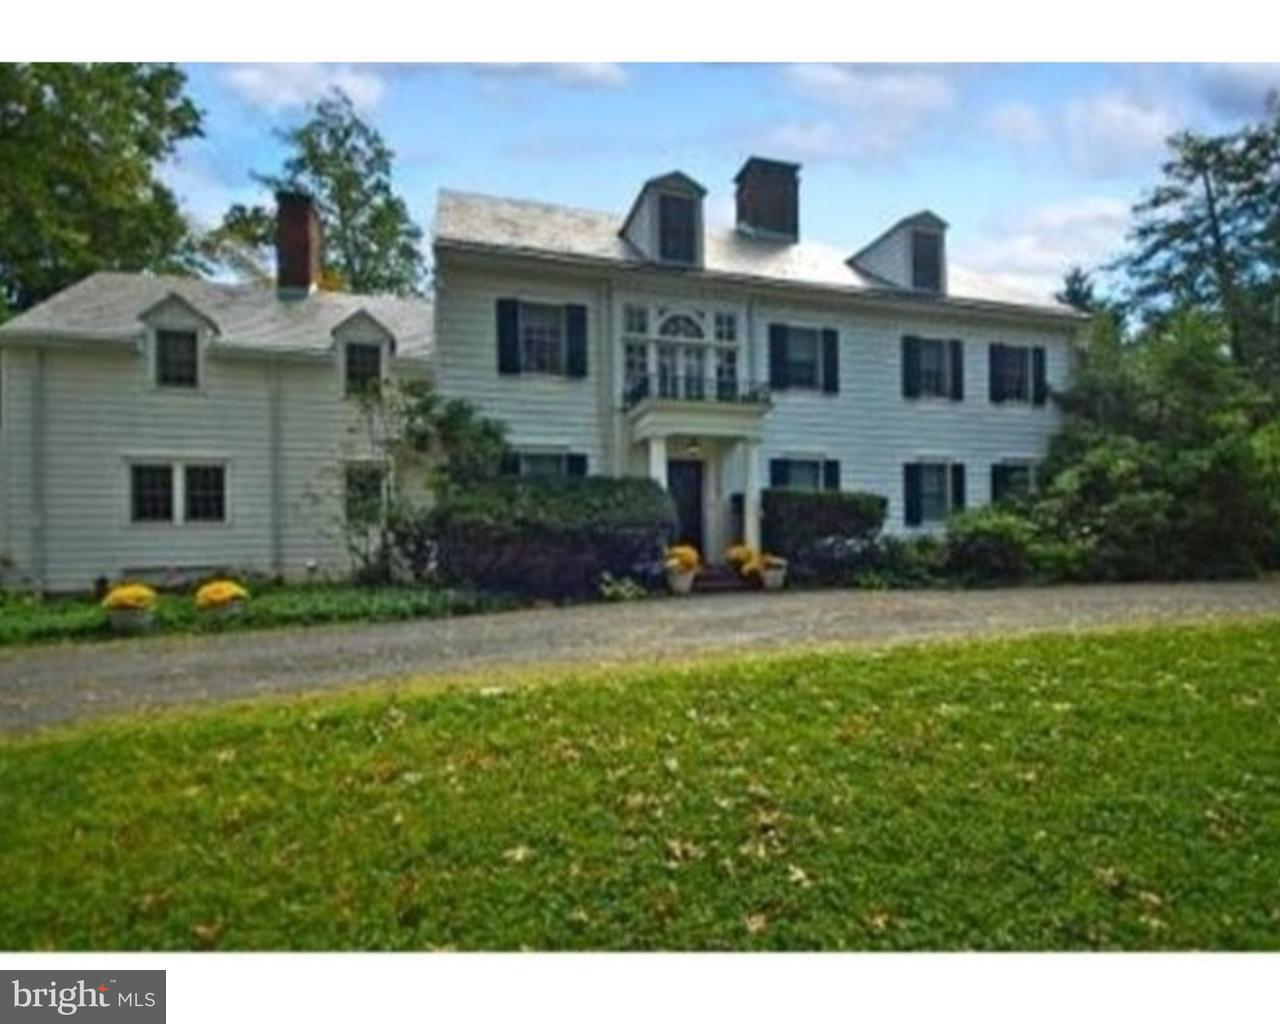 140 Hodge Rd, Princeton, NJ, 08540